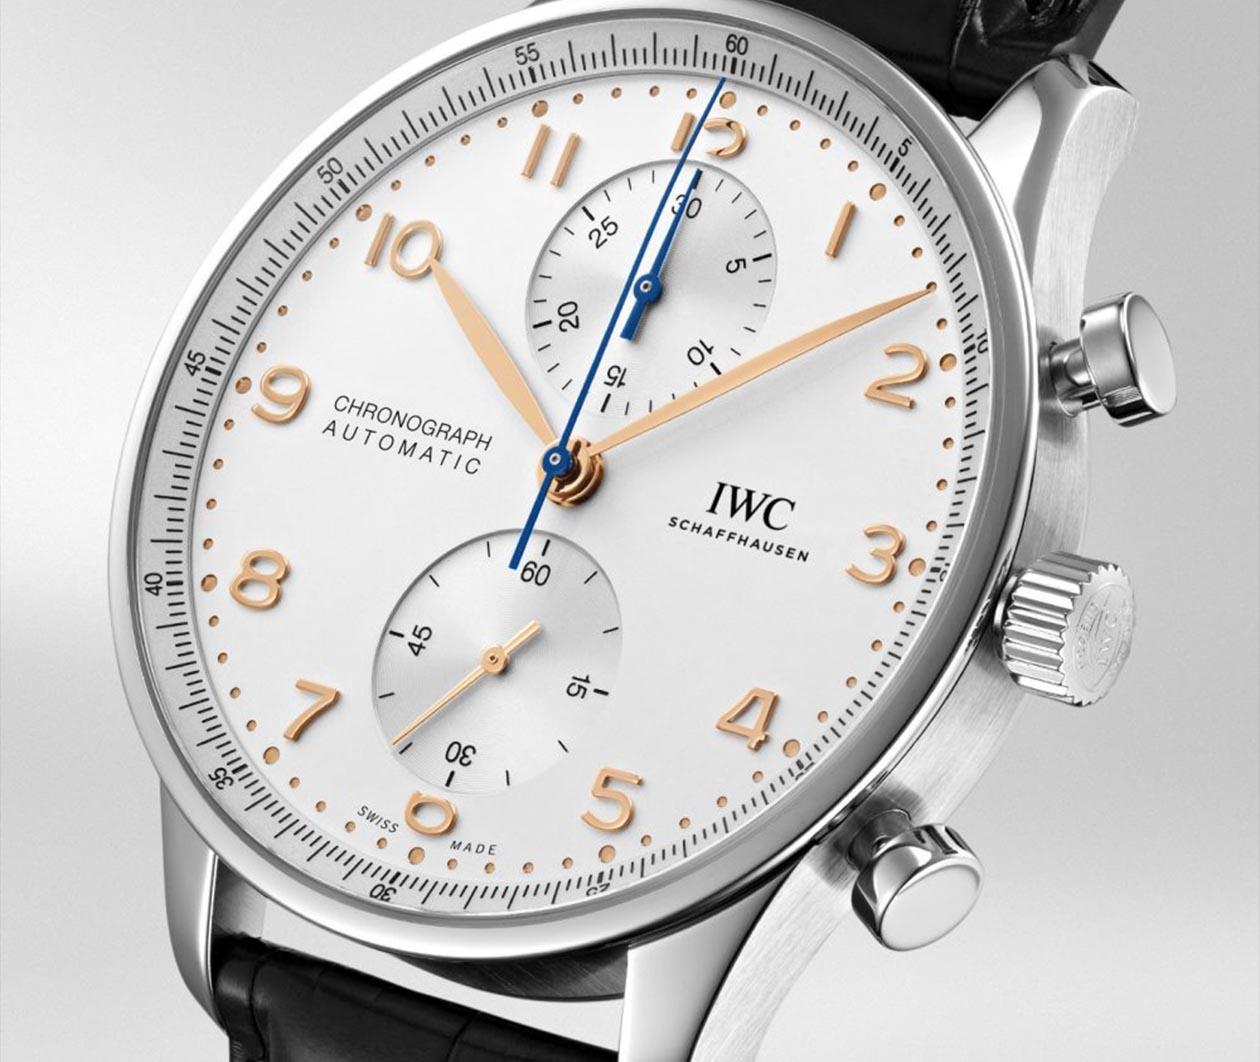 IWC Portugieser Chronograph IW371604 Carousel 3 FINAL